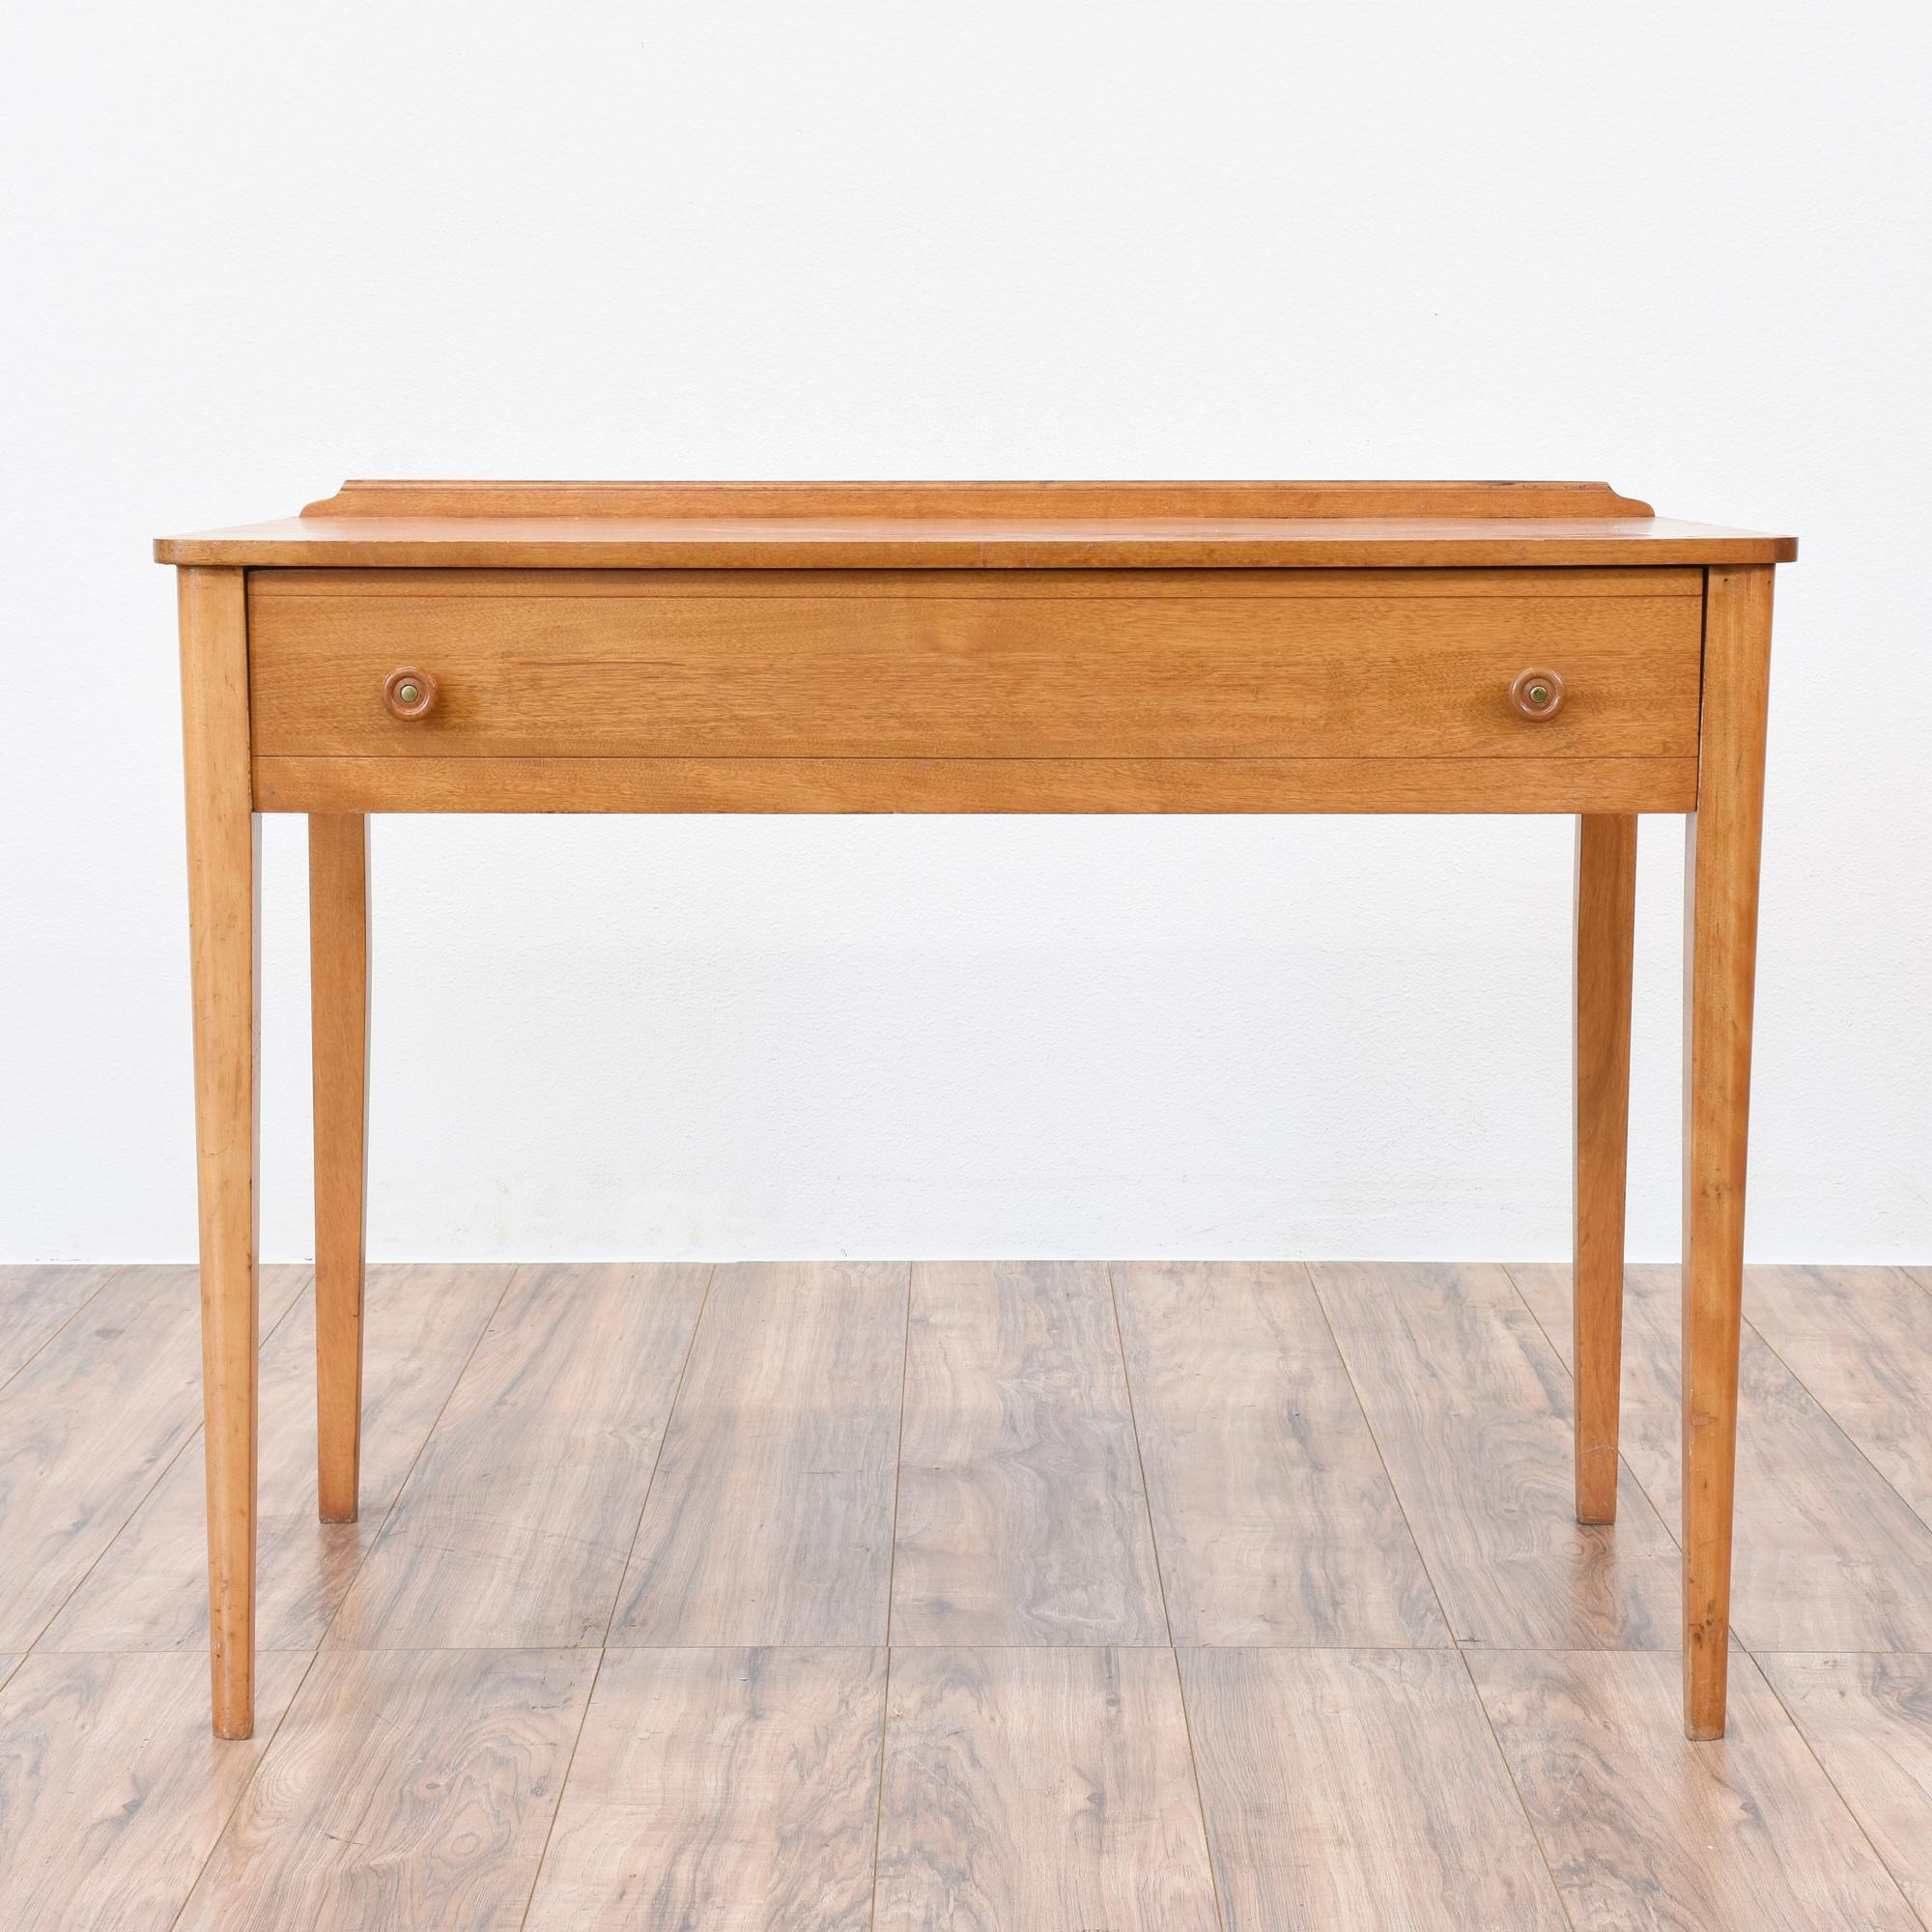 Simple mid century modern blonde wood desk loveseat for Mid century modern furniture san francisco